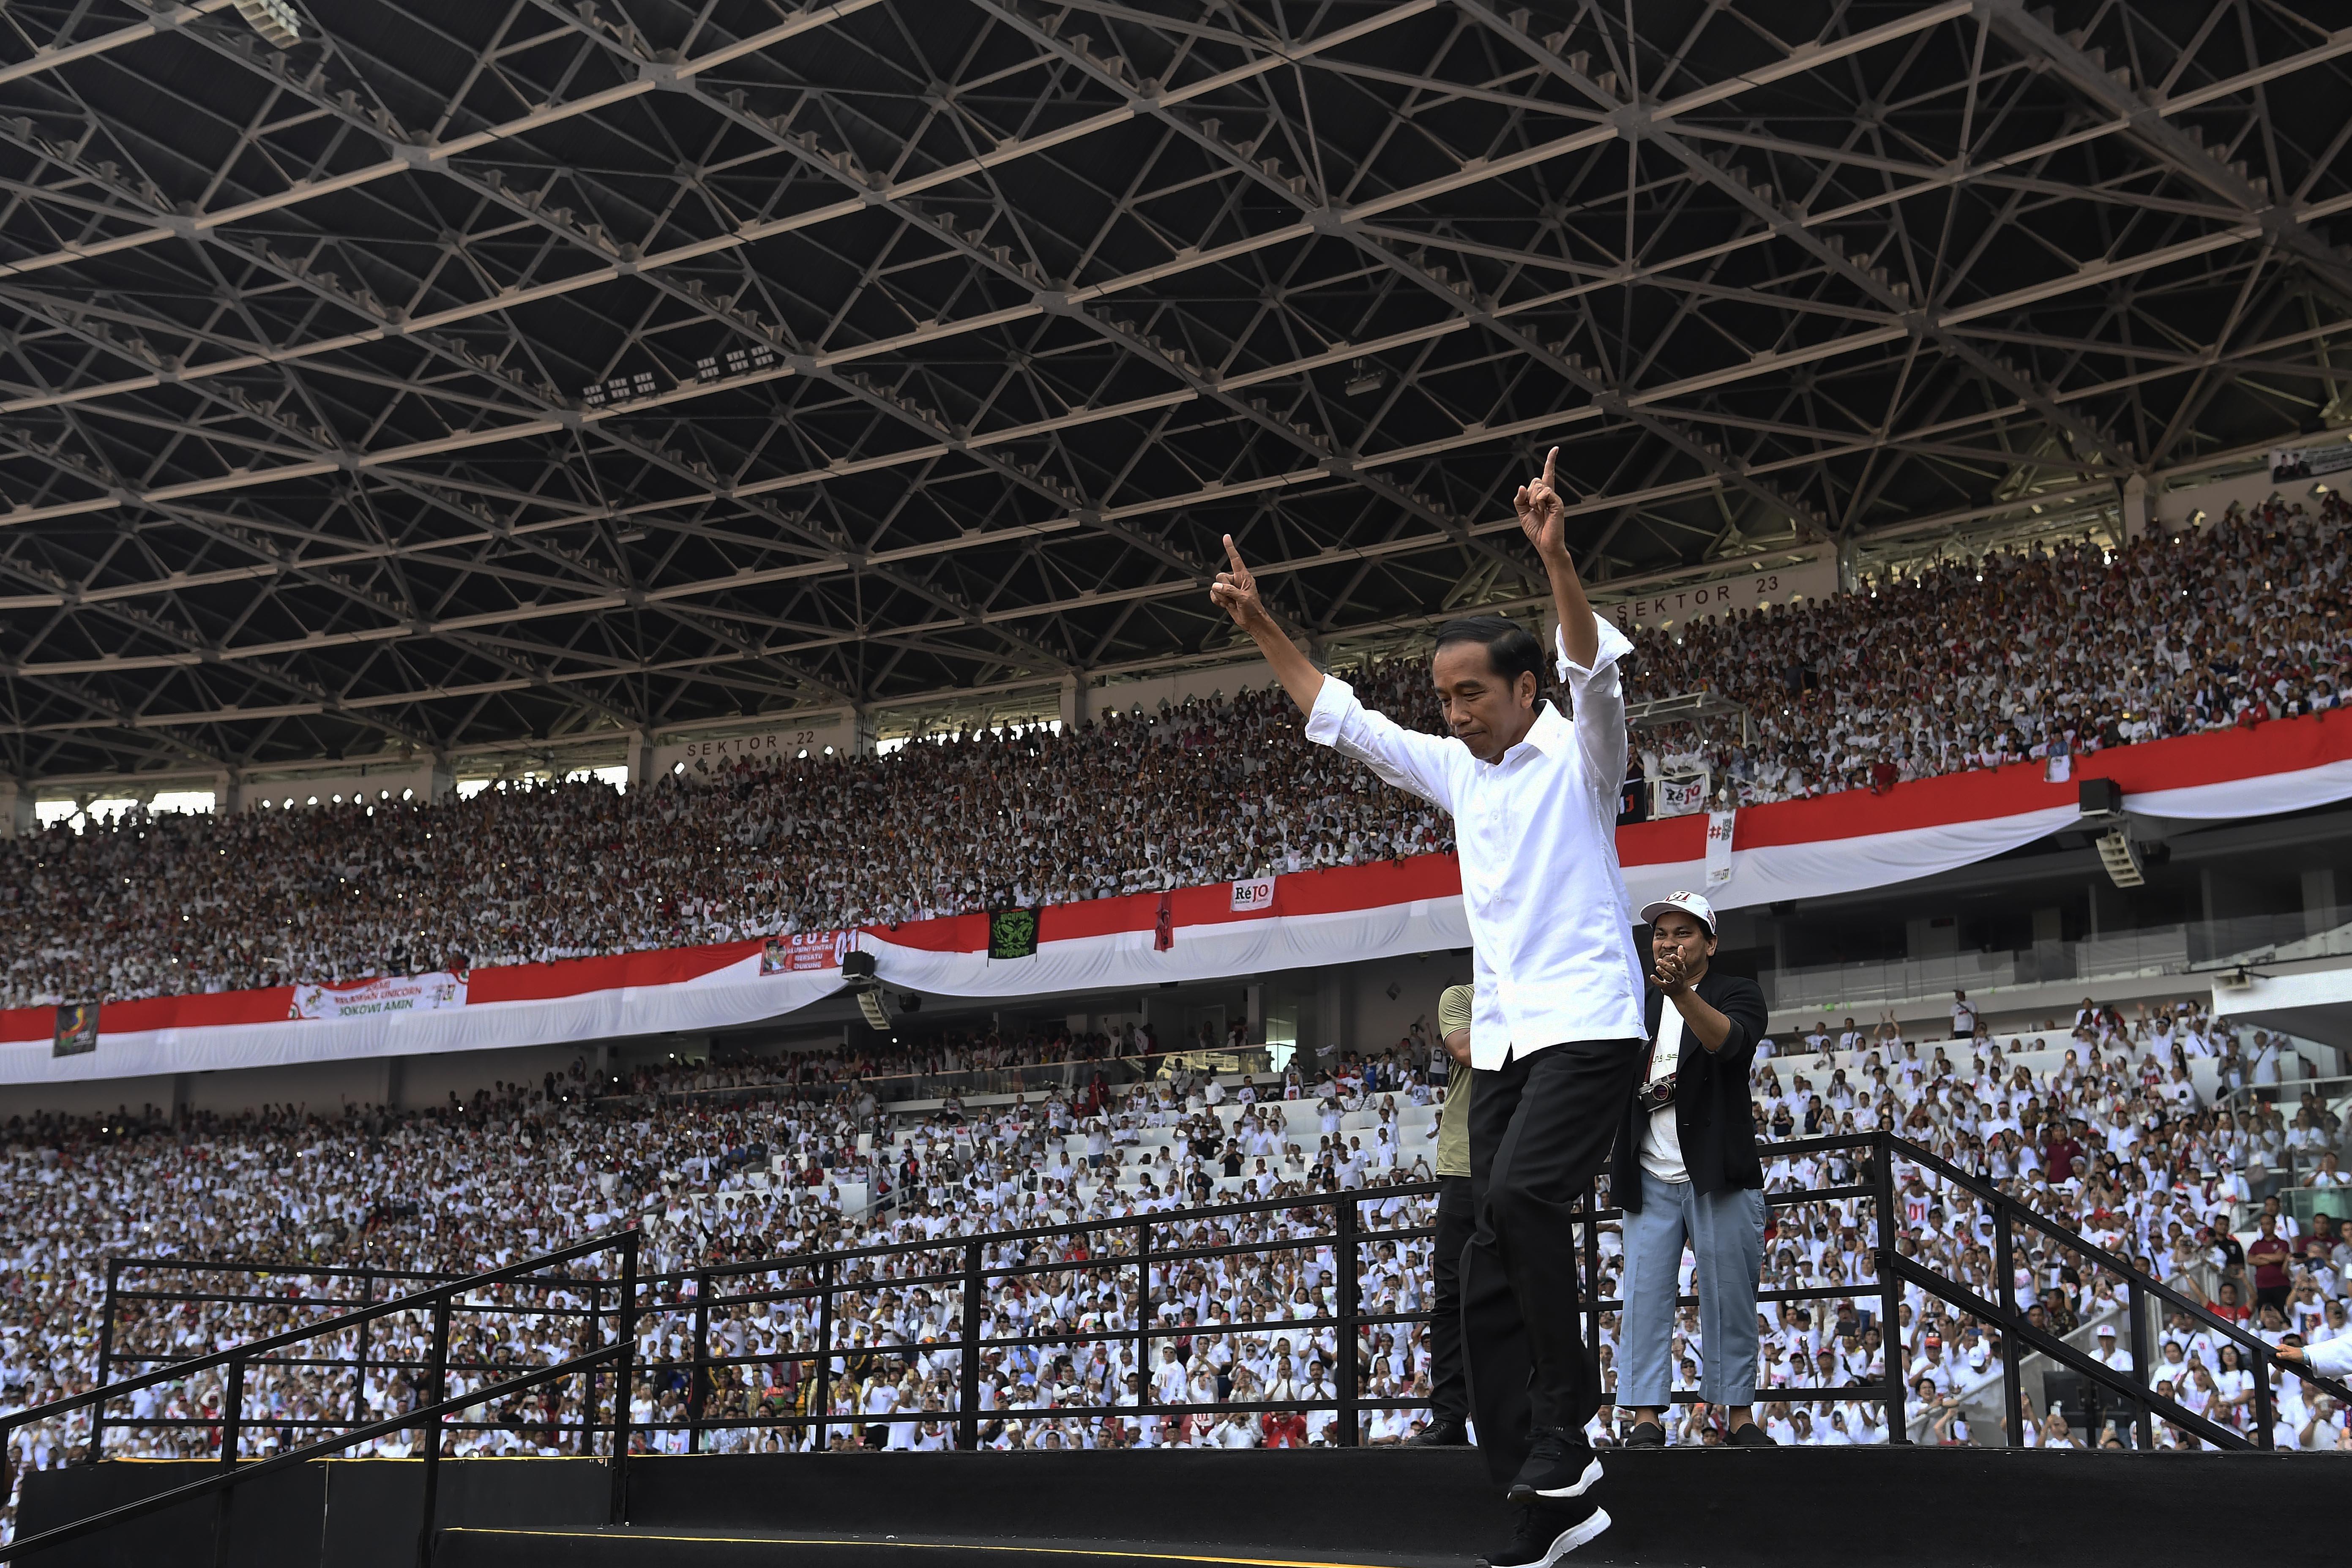 Calon Presiden nomor urut 01 Joko Widodo berlari menuju panggung saat Konser Putih Bersatu di Stadion Utama GBK, Jakarta, Sabtu (13/4/2019). Konser Putih Bersatu menjadi puncak kampanye akbar pasangan capres dan cawapres nomor urut 01, Joko Widodo-Maruf Amin sebelum memasuki masa tenang dan hari pemungutan suara (Pemilu) serentak pada Rabu, 17 April 2019 mendatang.